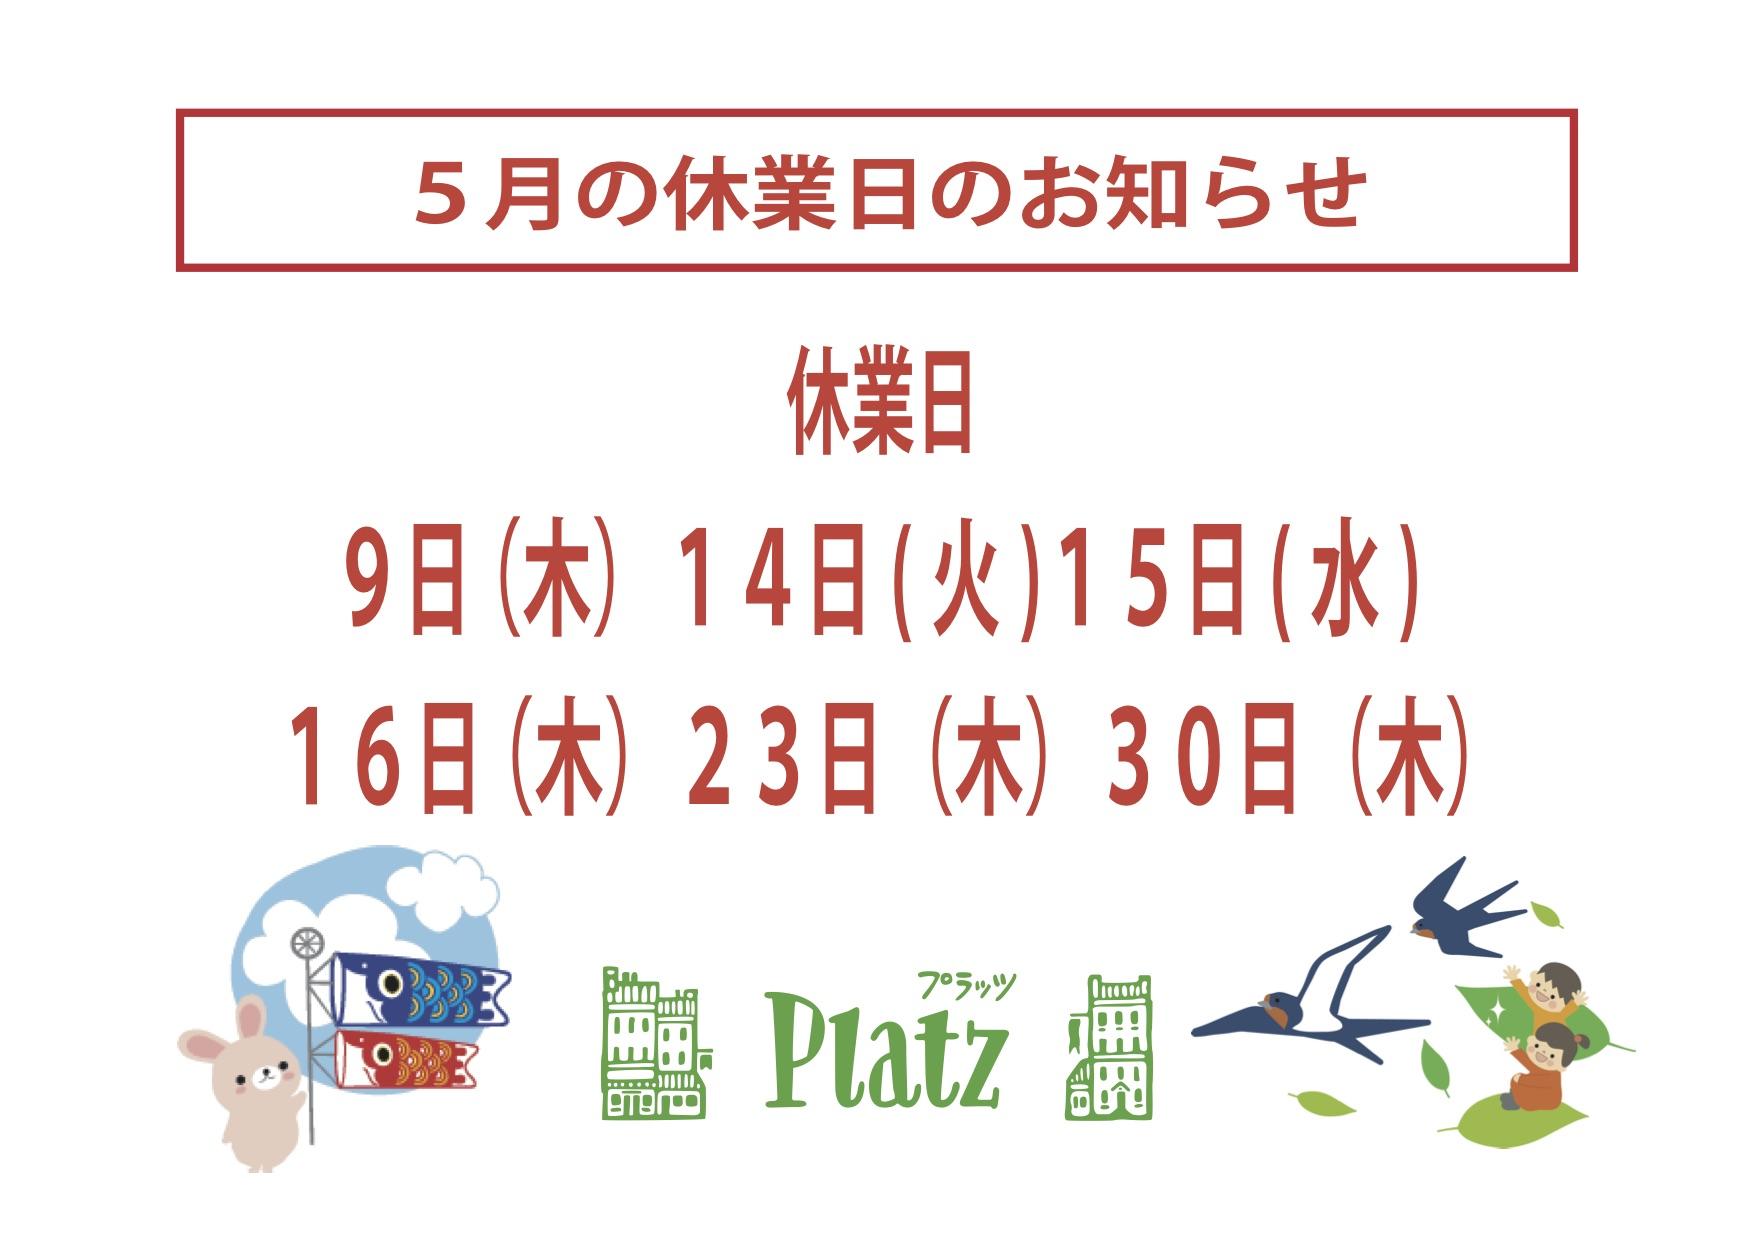 http://www.kyoto-platz.jp/news/images/2019.%EF%BC%95%E6%9C%88%E4%BC%91%E6%A5%AD%E6%97%A5.jpg